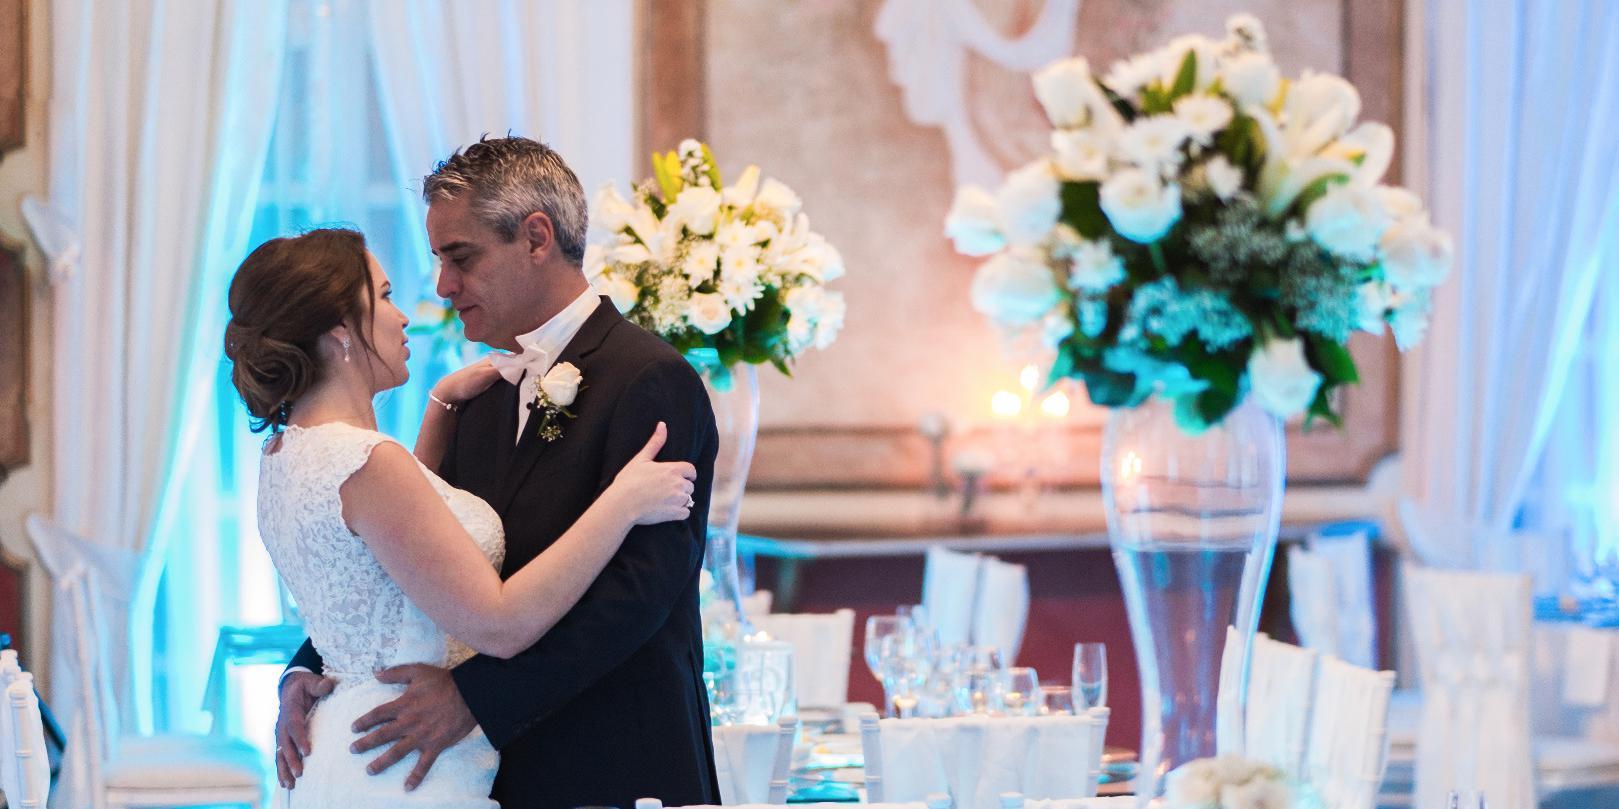 bodas-sin-clasificar-sin-tema-cuba-30901.jpg